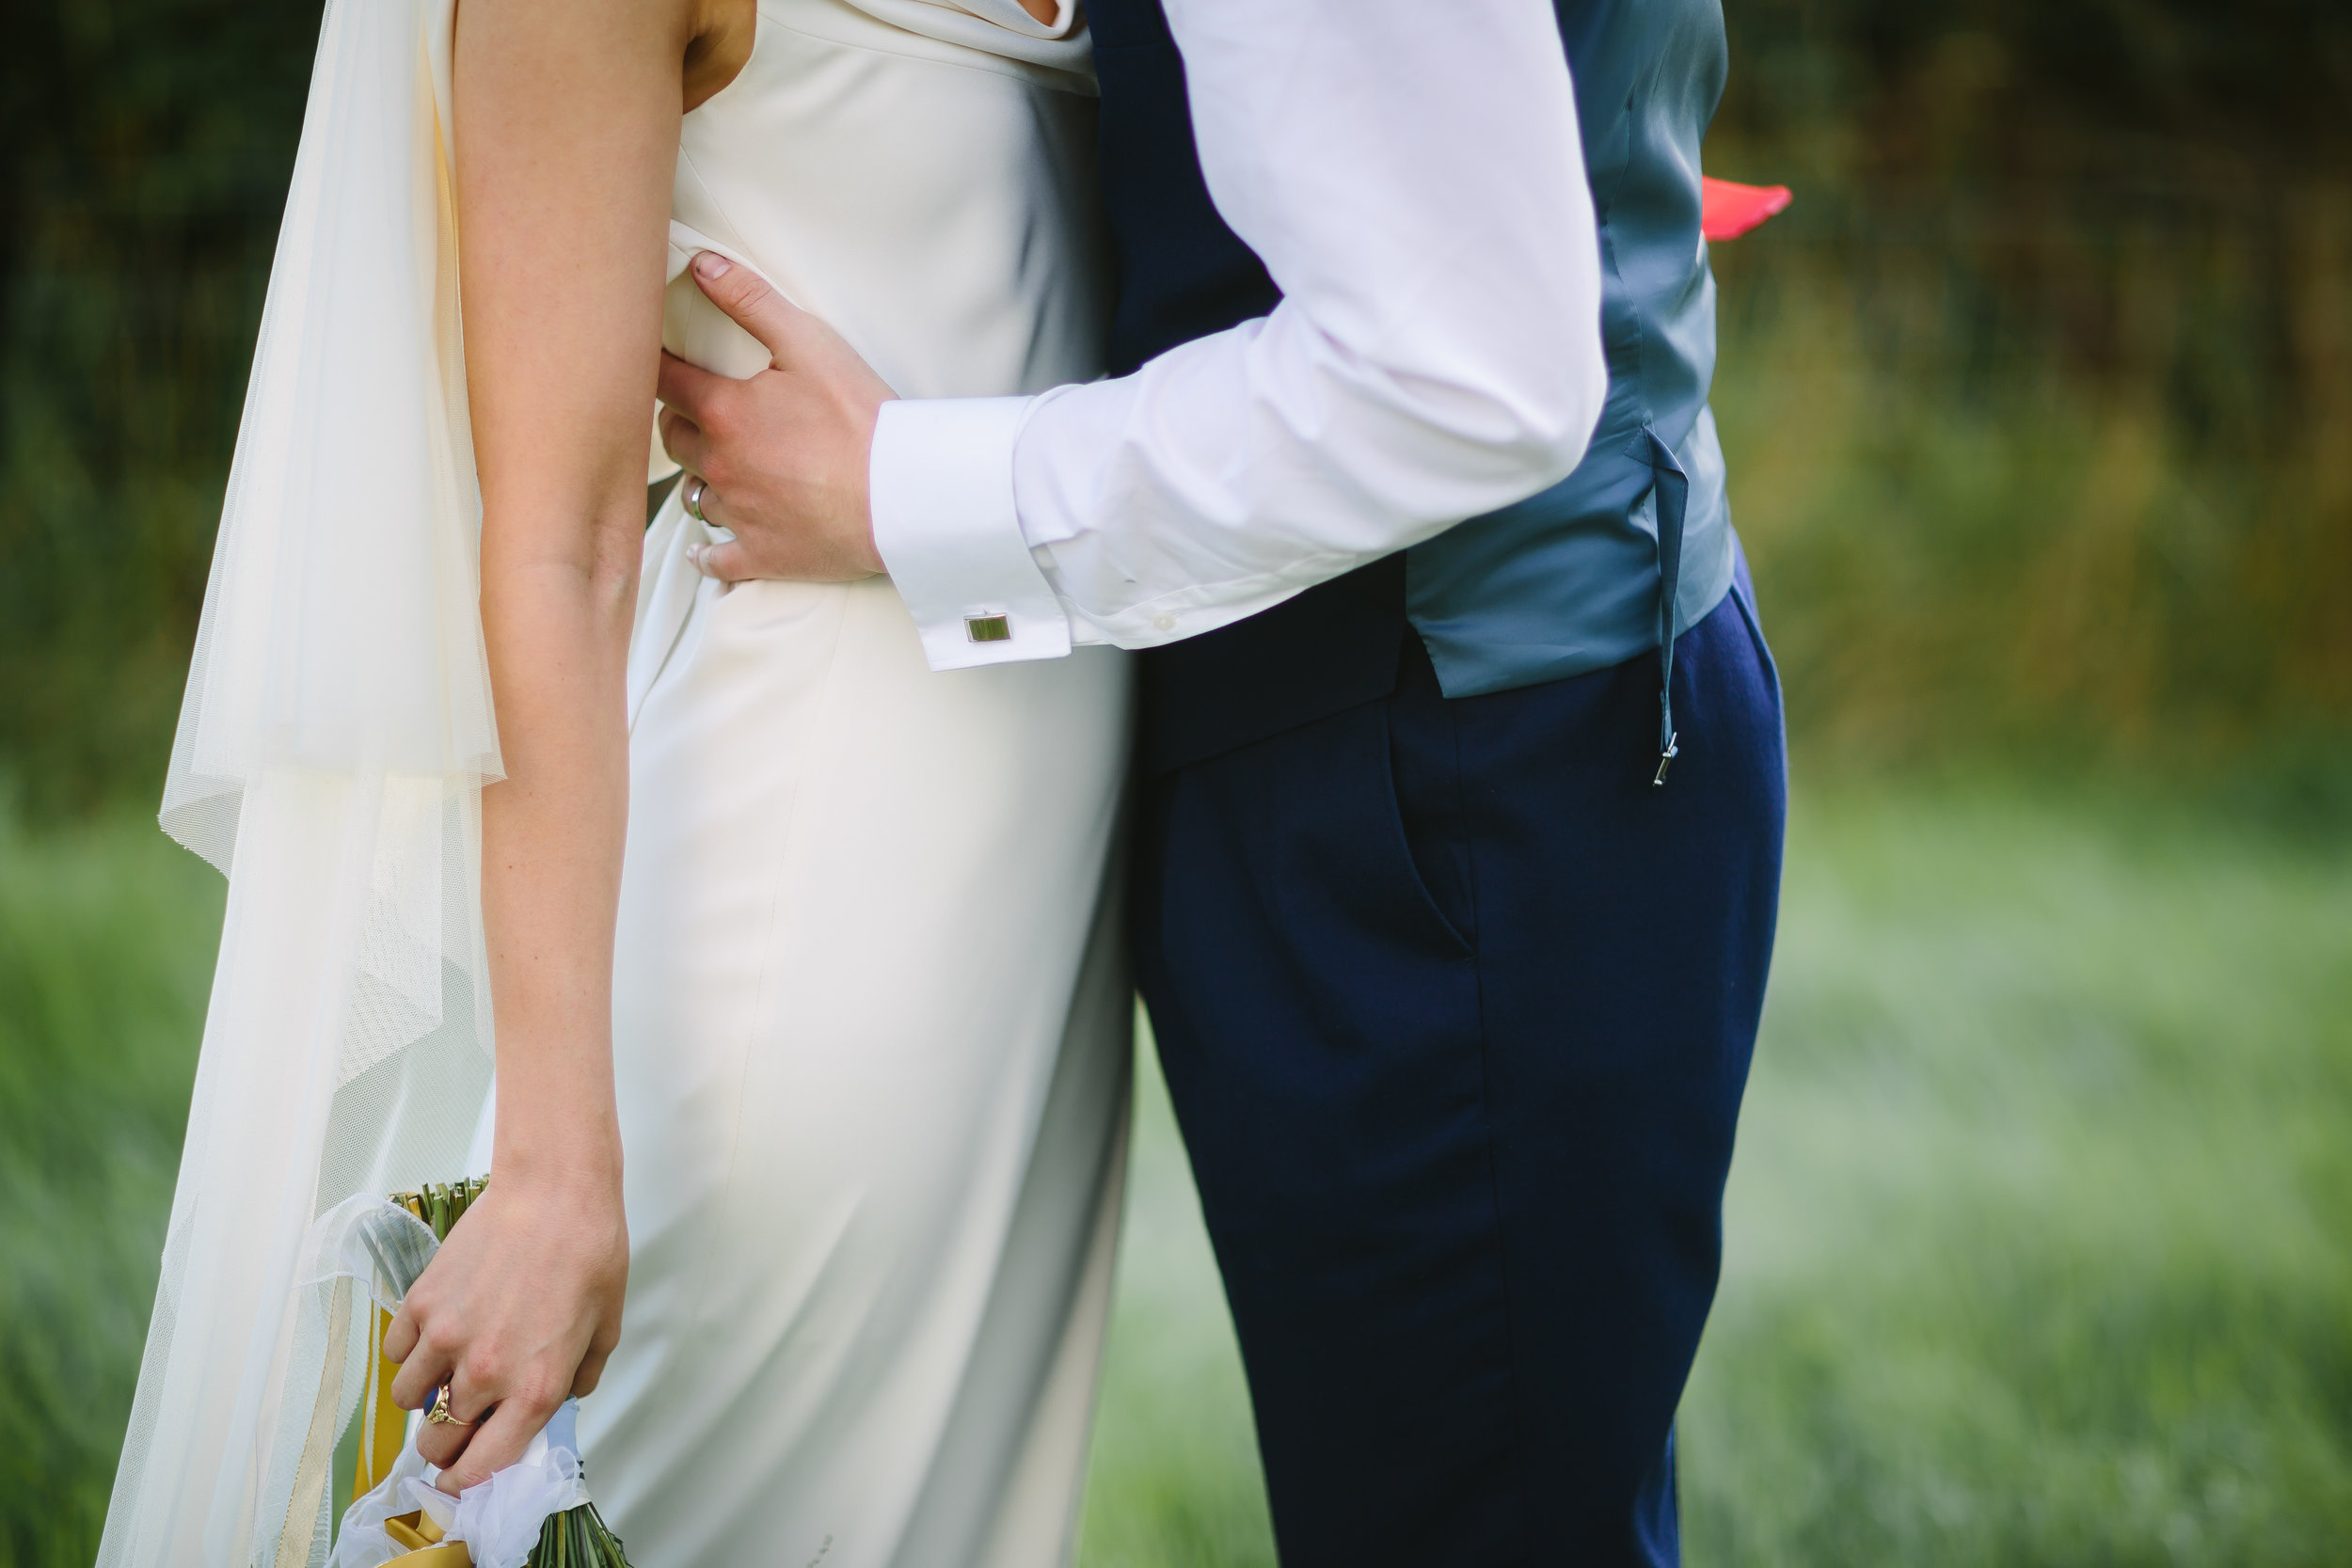 Wedding-Stockerston-Weddingphotographer-85.jpg